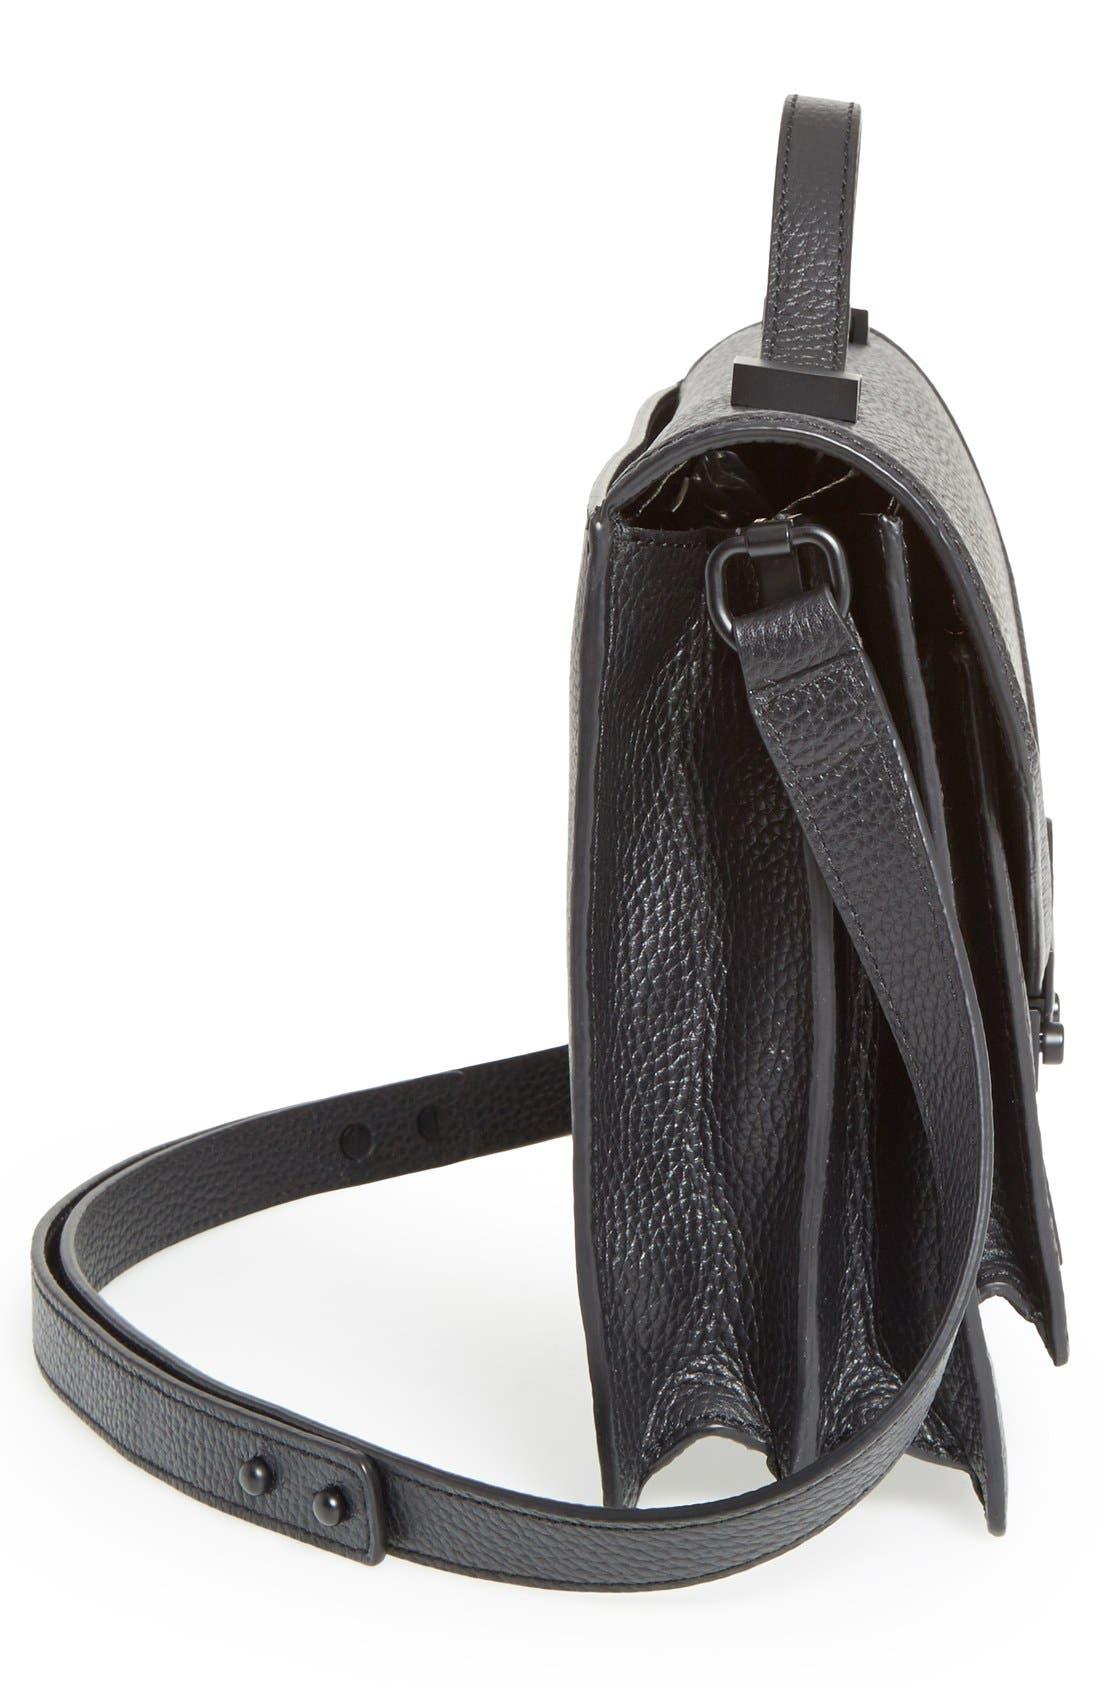 LOEFFLER RANDALL,                             'Medium Rider' Leather Top Handle Satchel,                             Alternate thumbnail 4, color,                             001